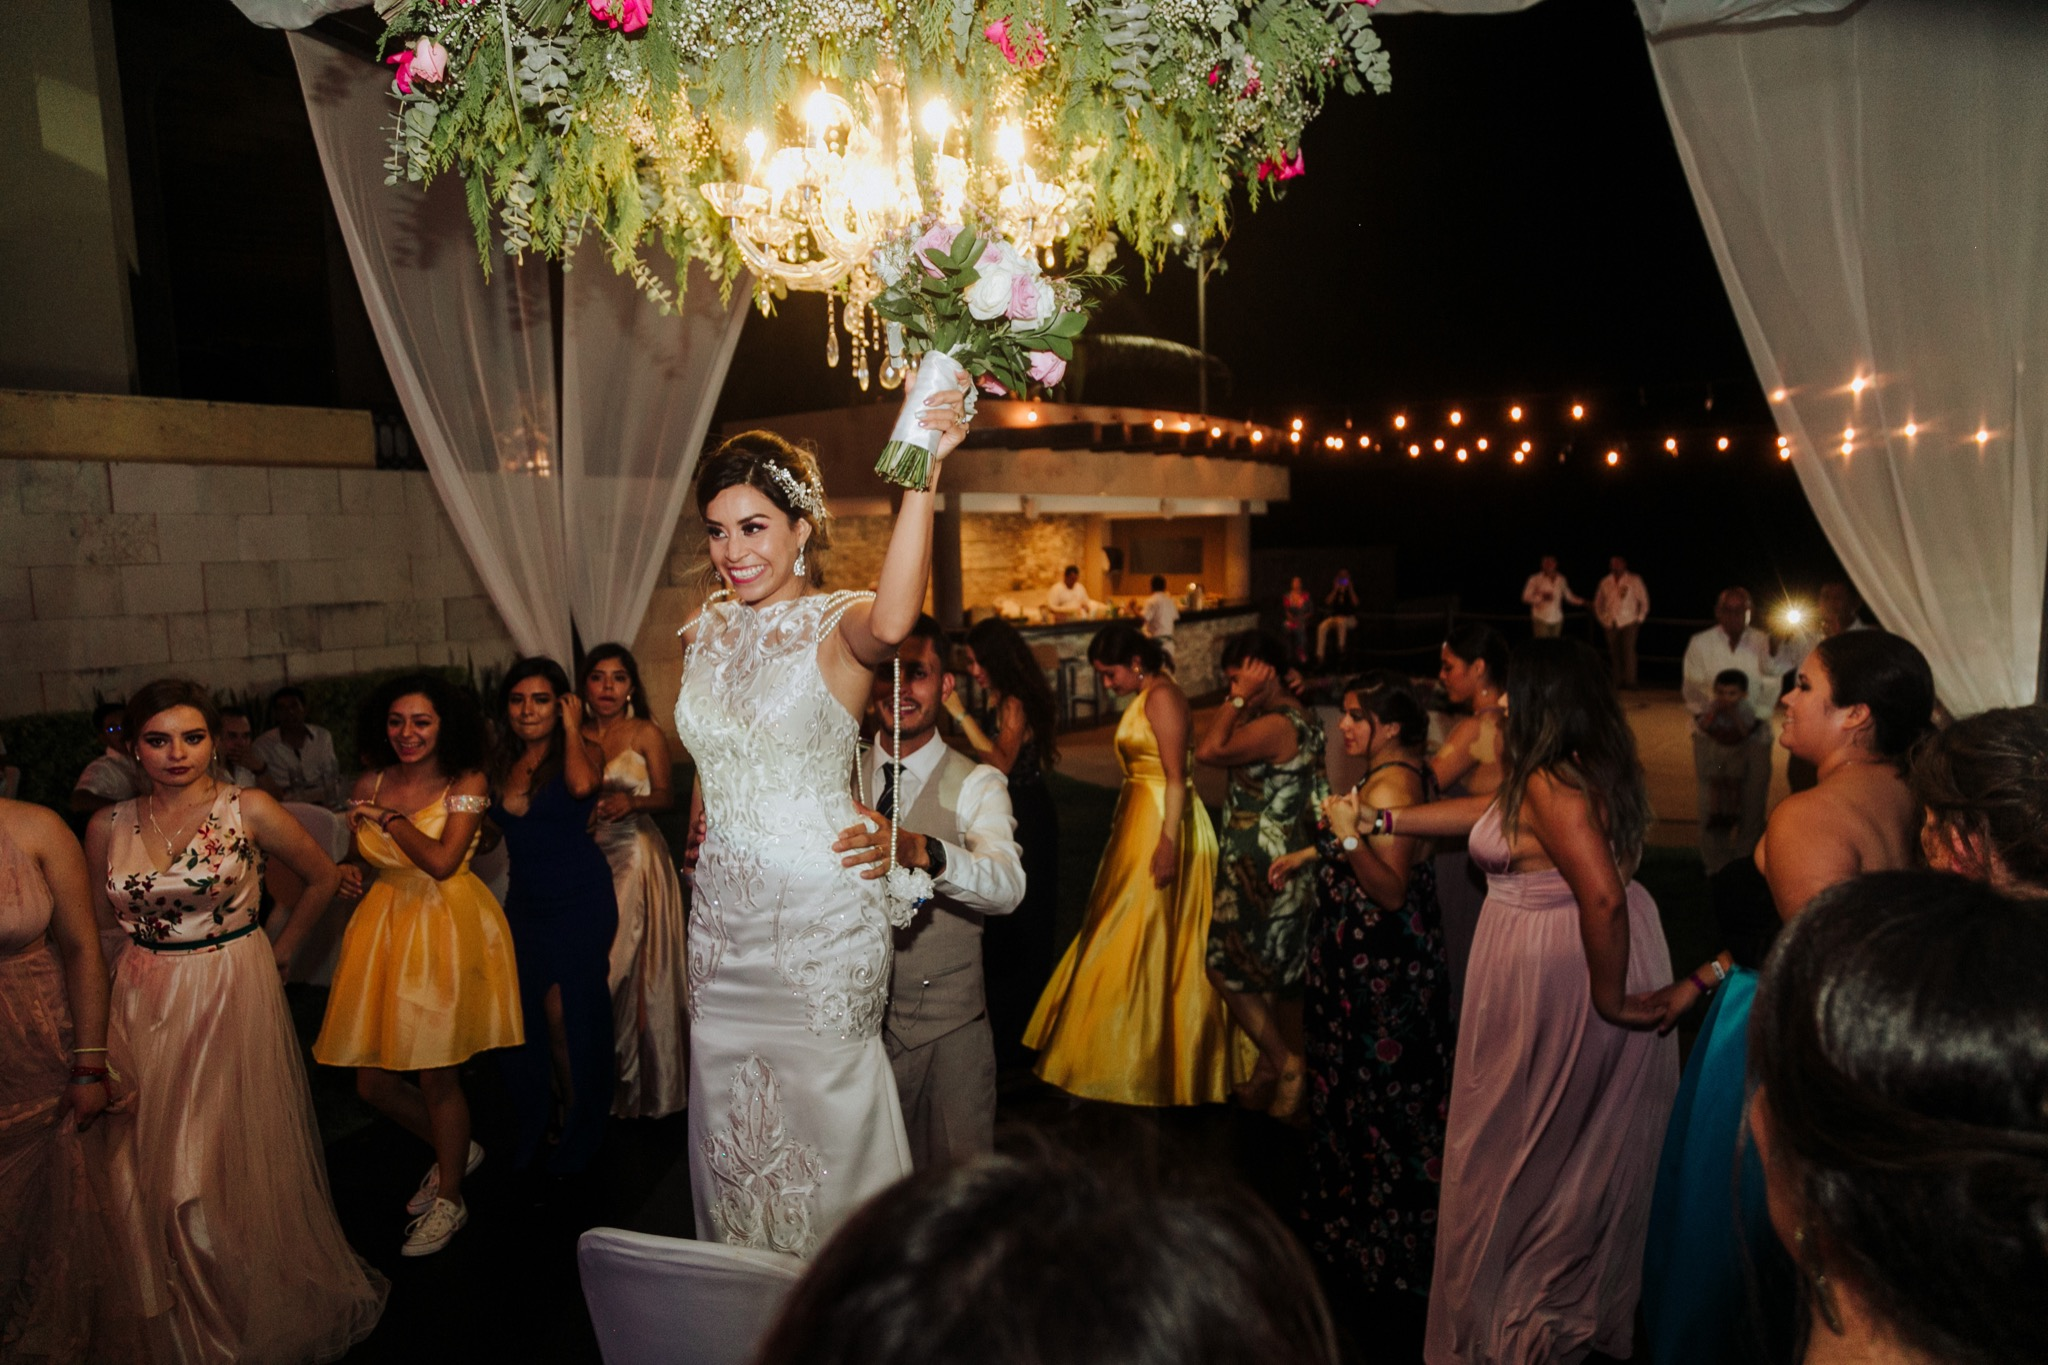 Javier_noriega_fotografo_bodas_profesional_zacatecas_mexico_mazatlan_sinaloa_photographer_weddings78